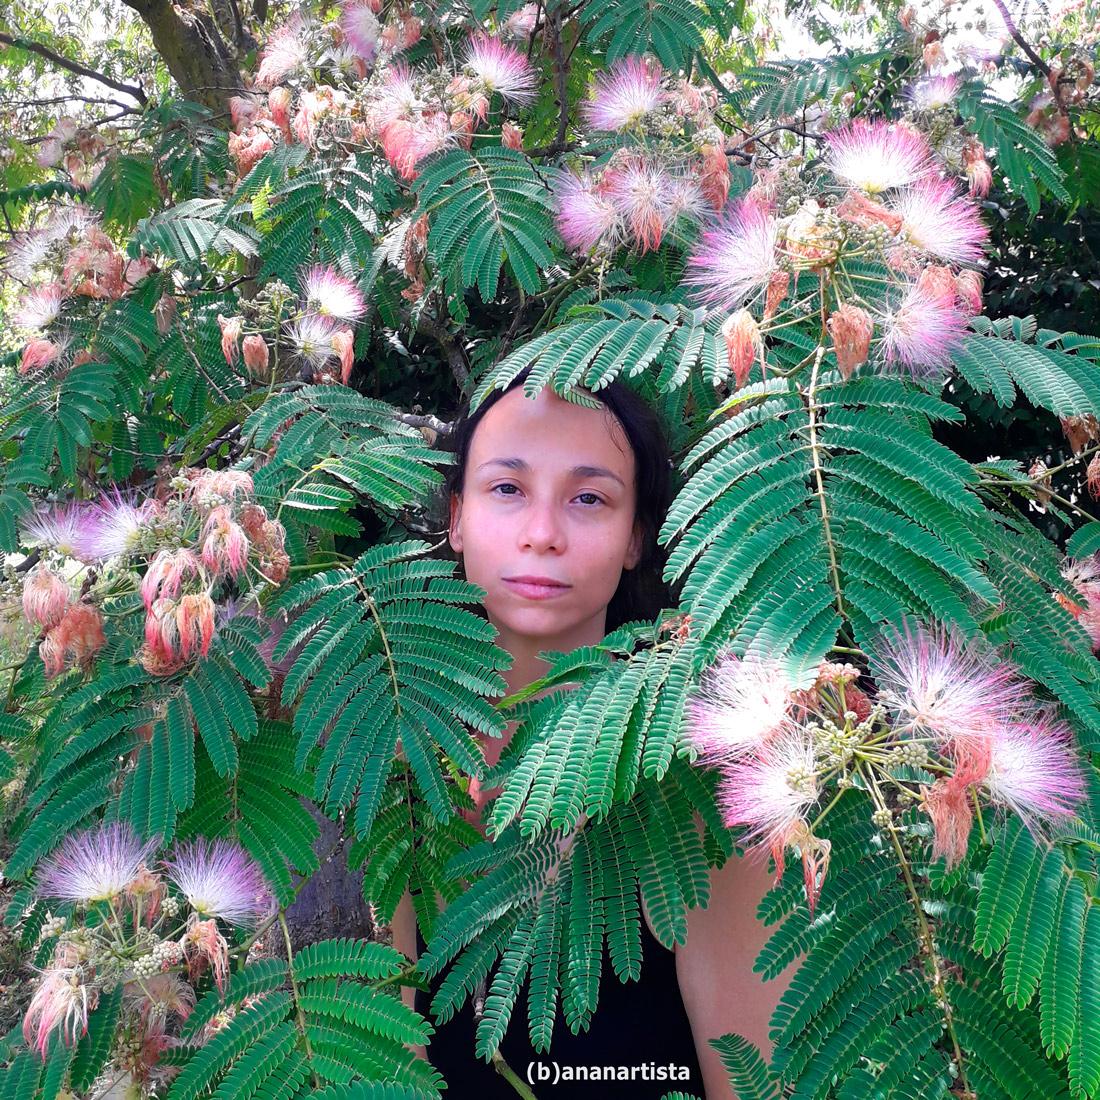 wayuu girl in the amazon jungle portrait by (b)ananartista sbuff